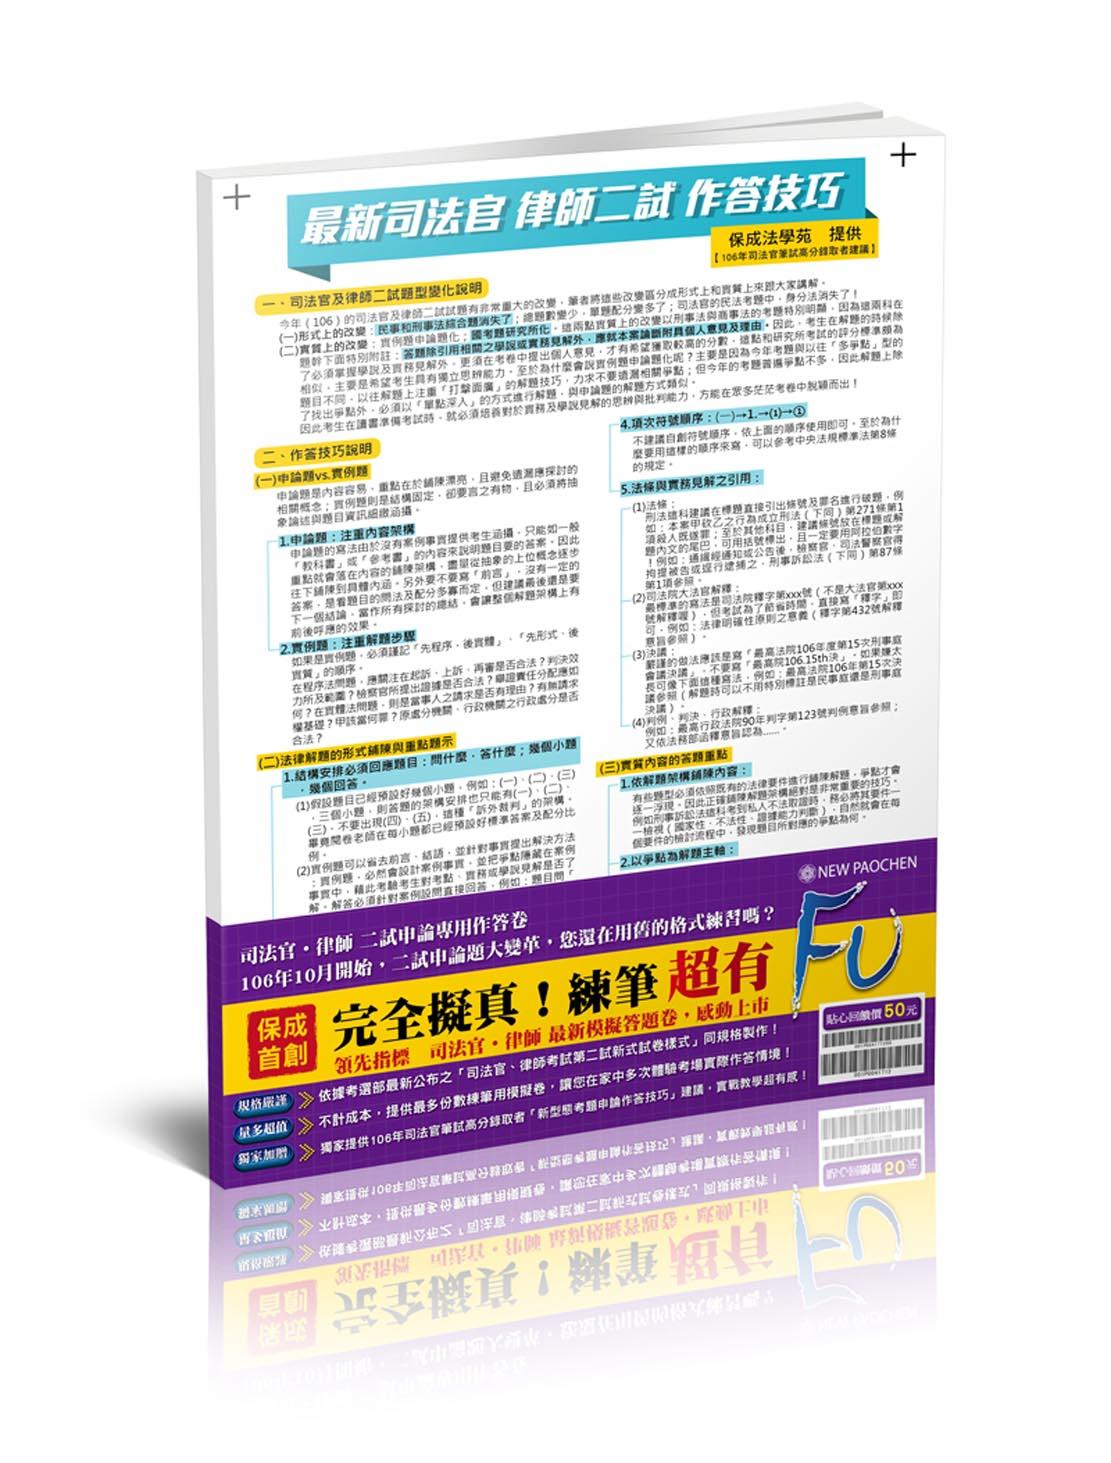 1P004-司法官、律师考试第二试新式申论题国家考试卷(保成)